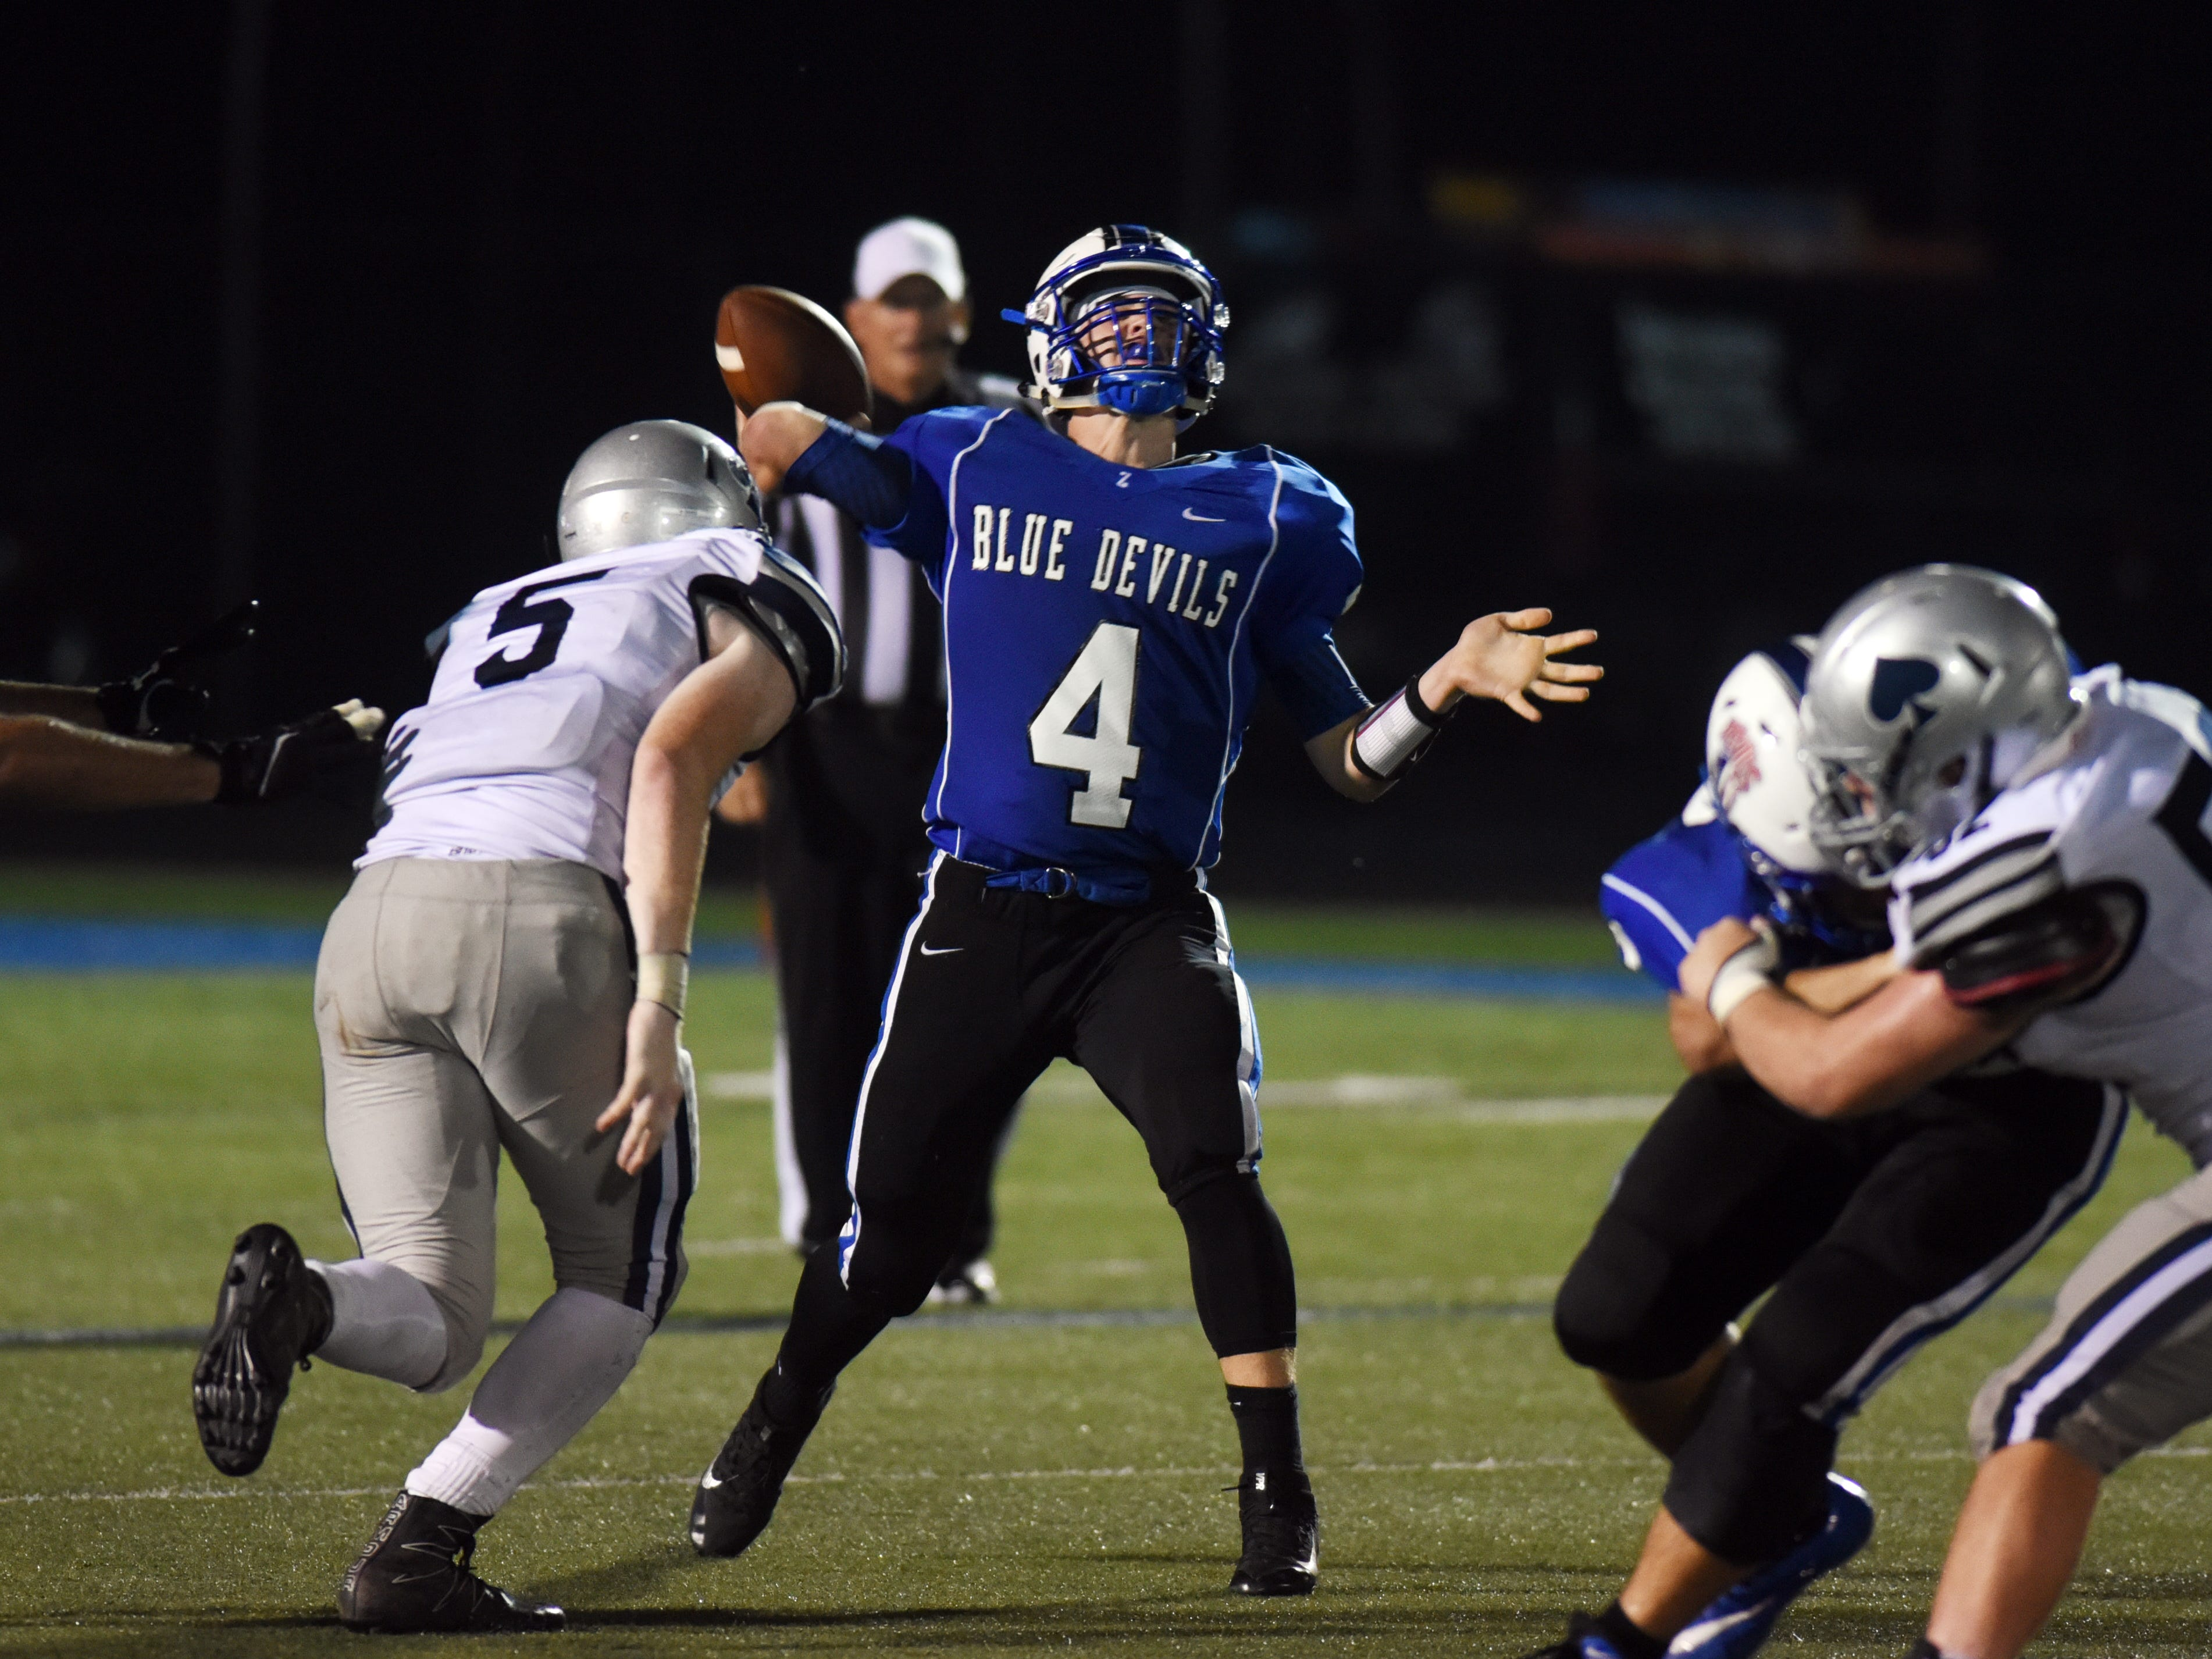 Granville defensive end Garrett Sutliff pressures Zanesville quarterback Ben Everson Friday, during the Blue Aces' 17-14 win in John D. Sulsberger Memorial Stadium.